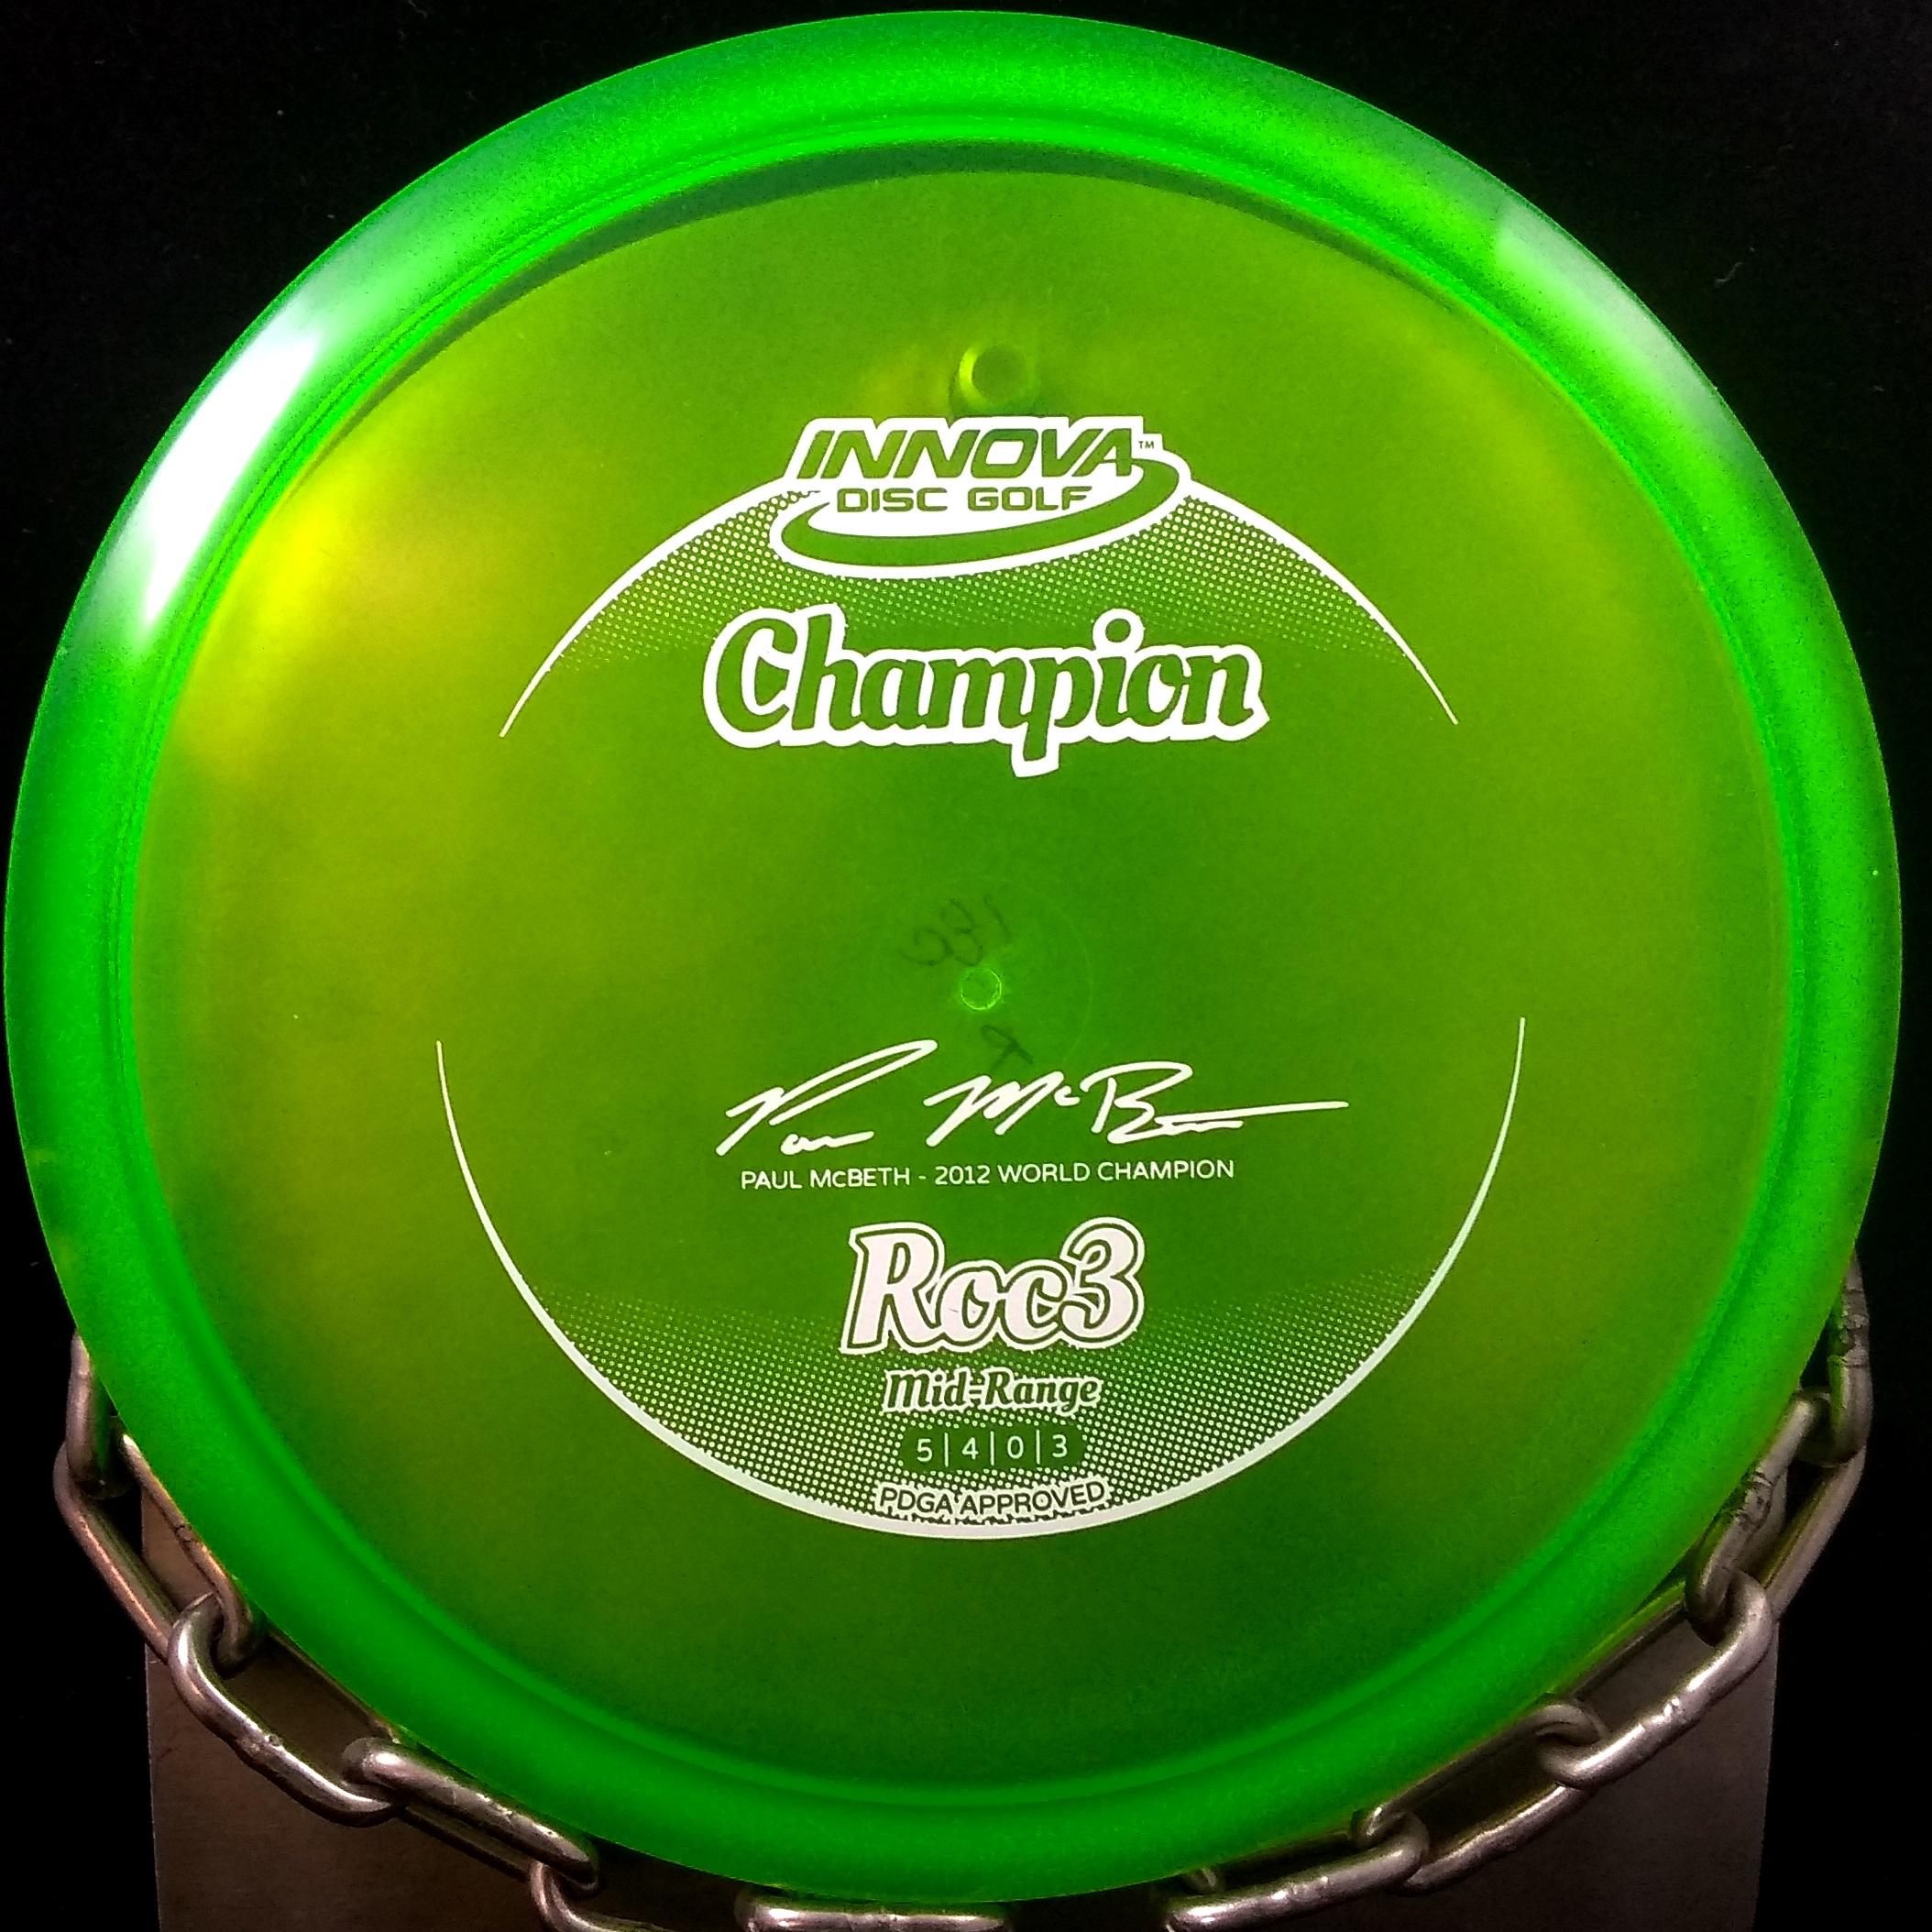 Paul McBeth 2012 1 Time World Champion ROC3 Innova Golf Disc